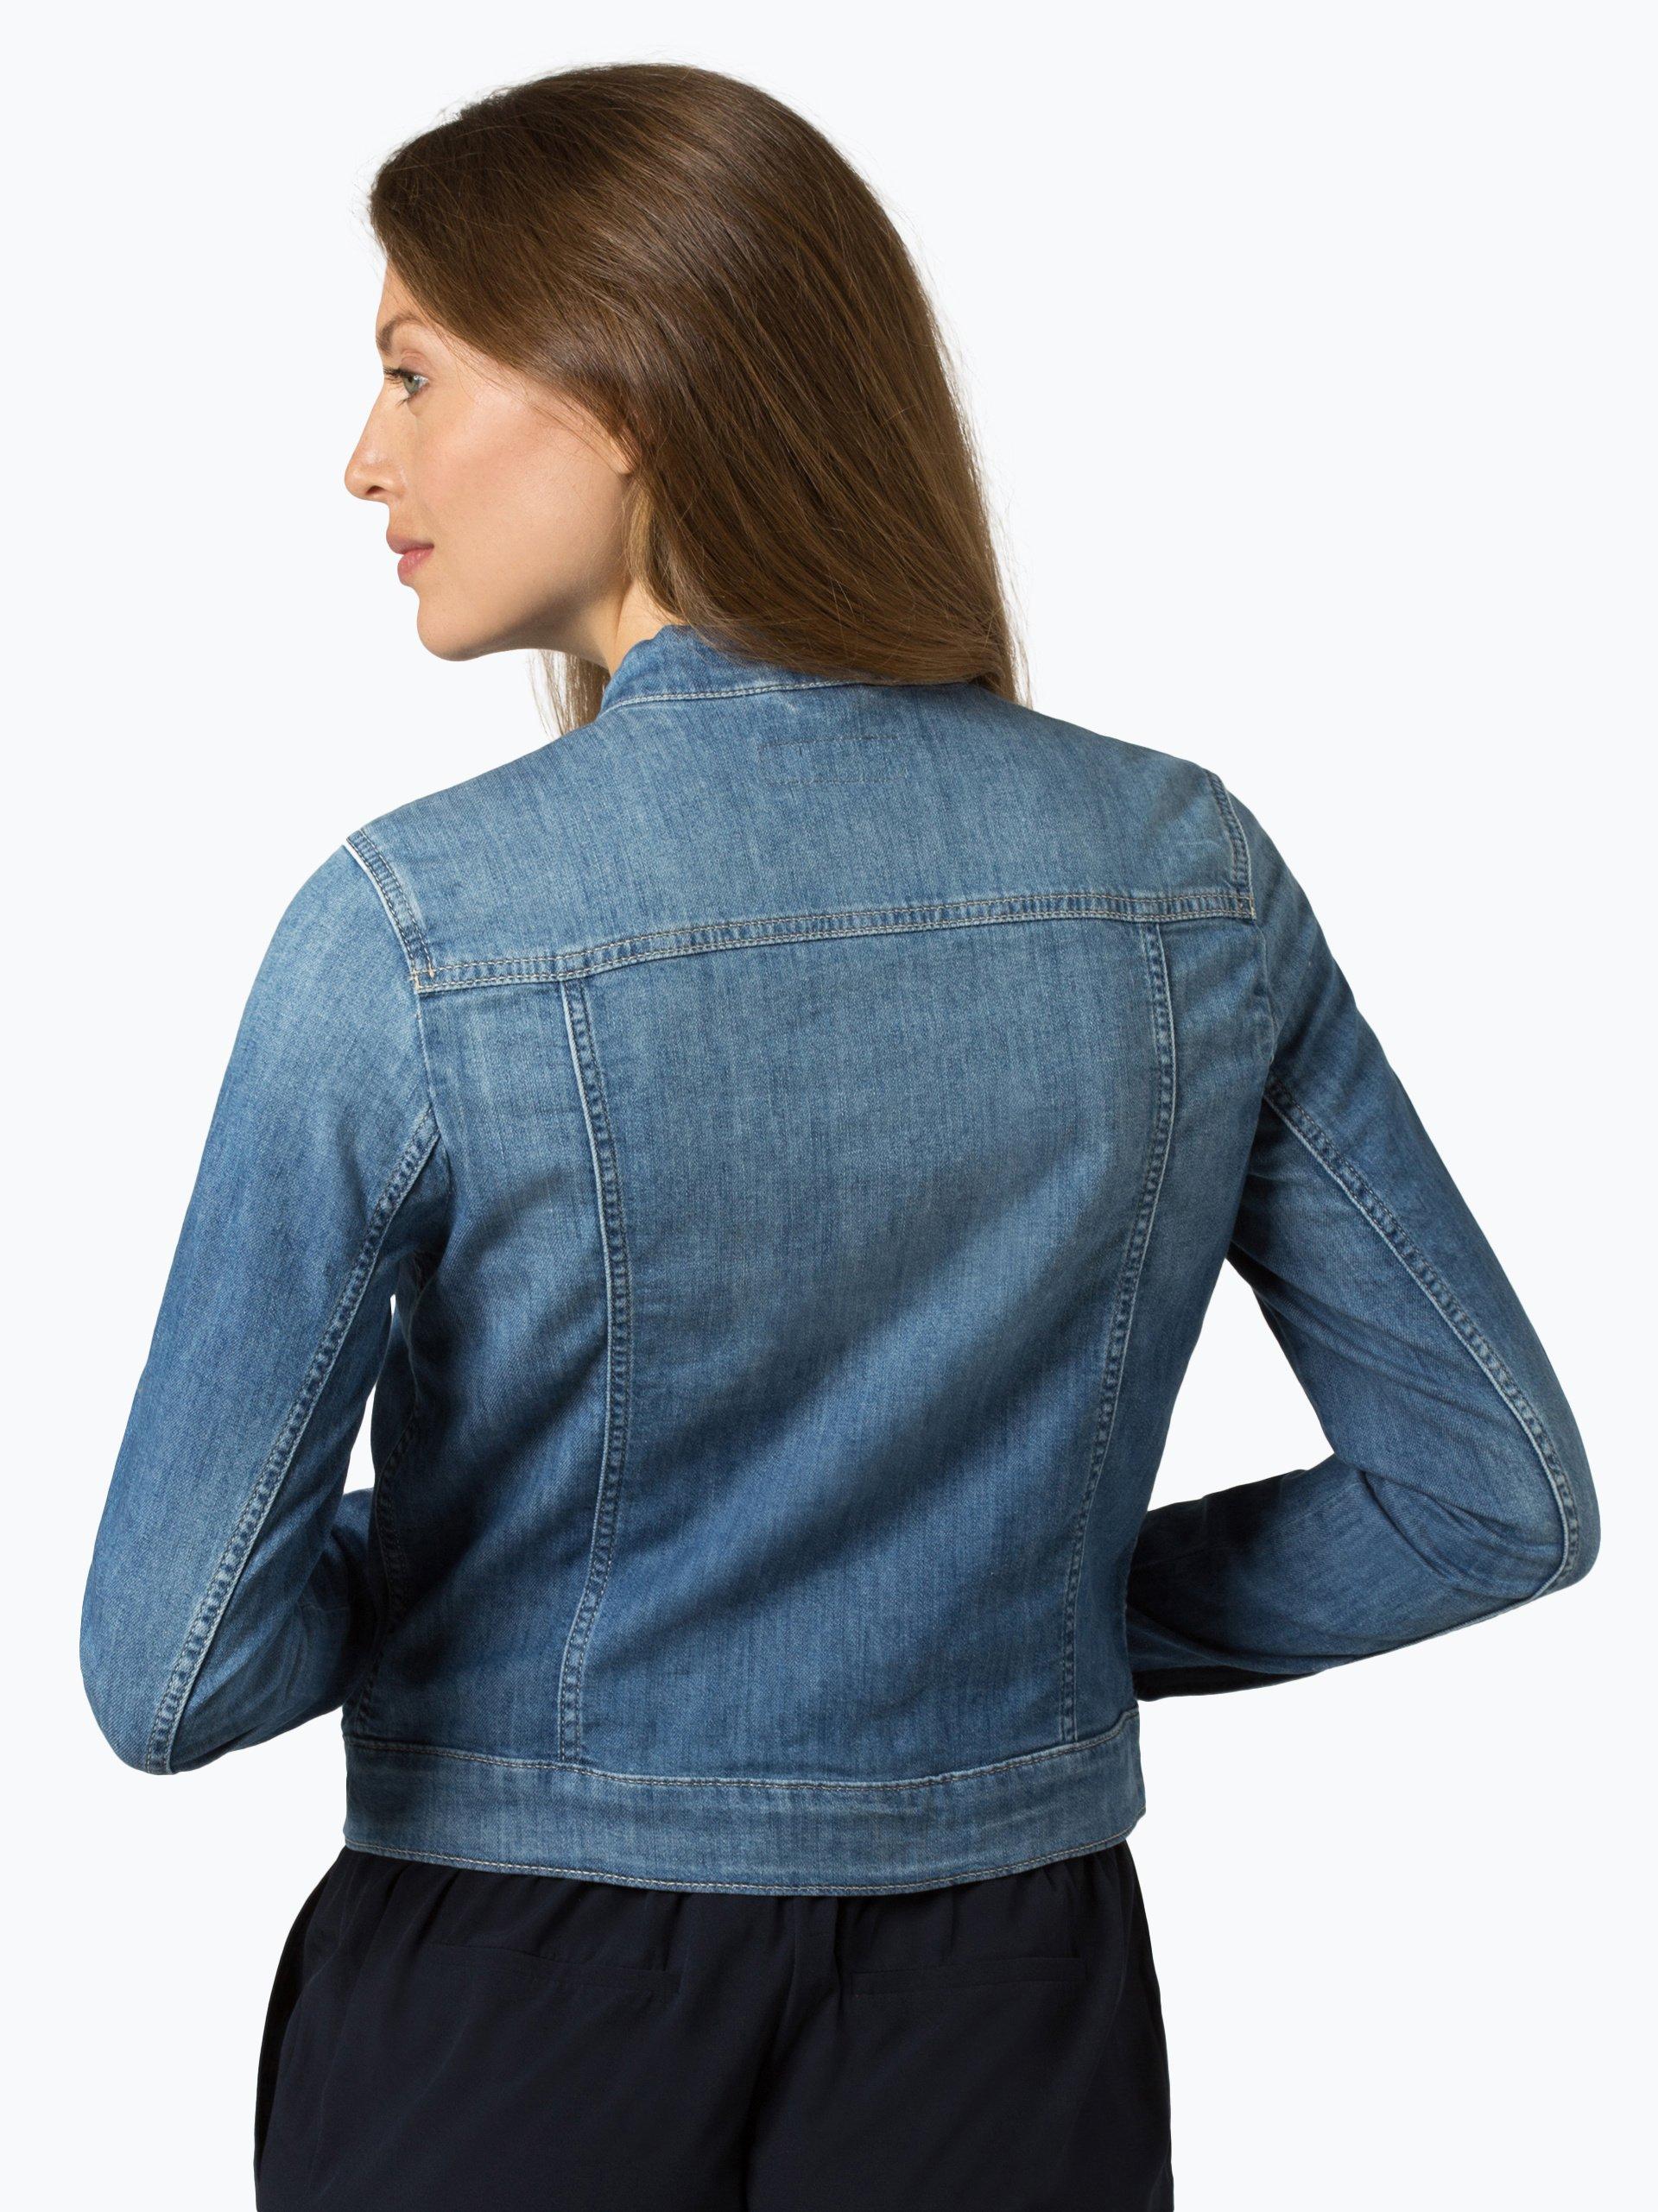 marc o 39 polo damen jeansjacke online kaufen peek und. Black Bedroom Furniture Sets. Home Design Ideas